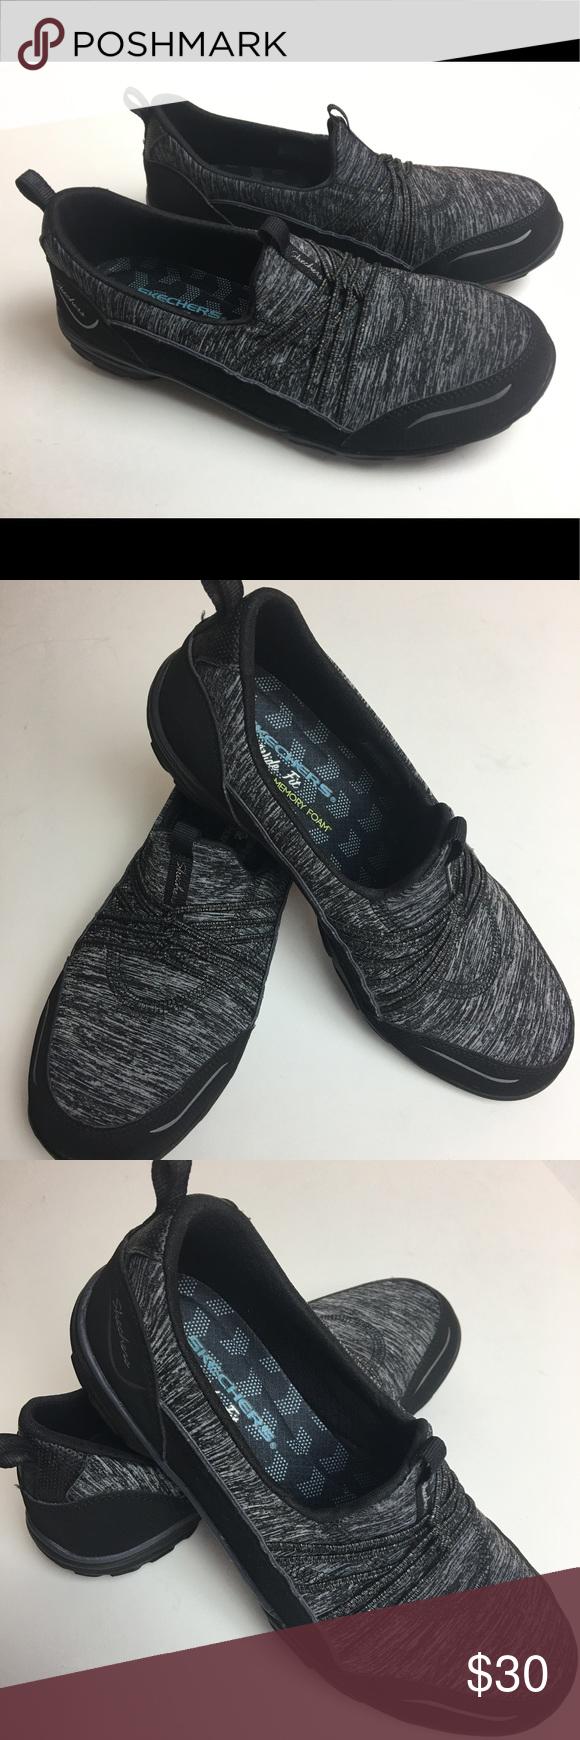 Skechers wide fit shoe | Wide fit shoes